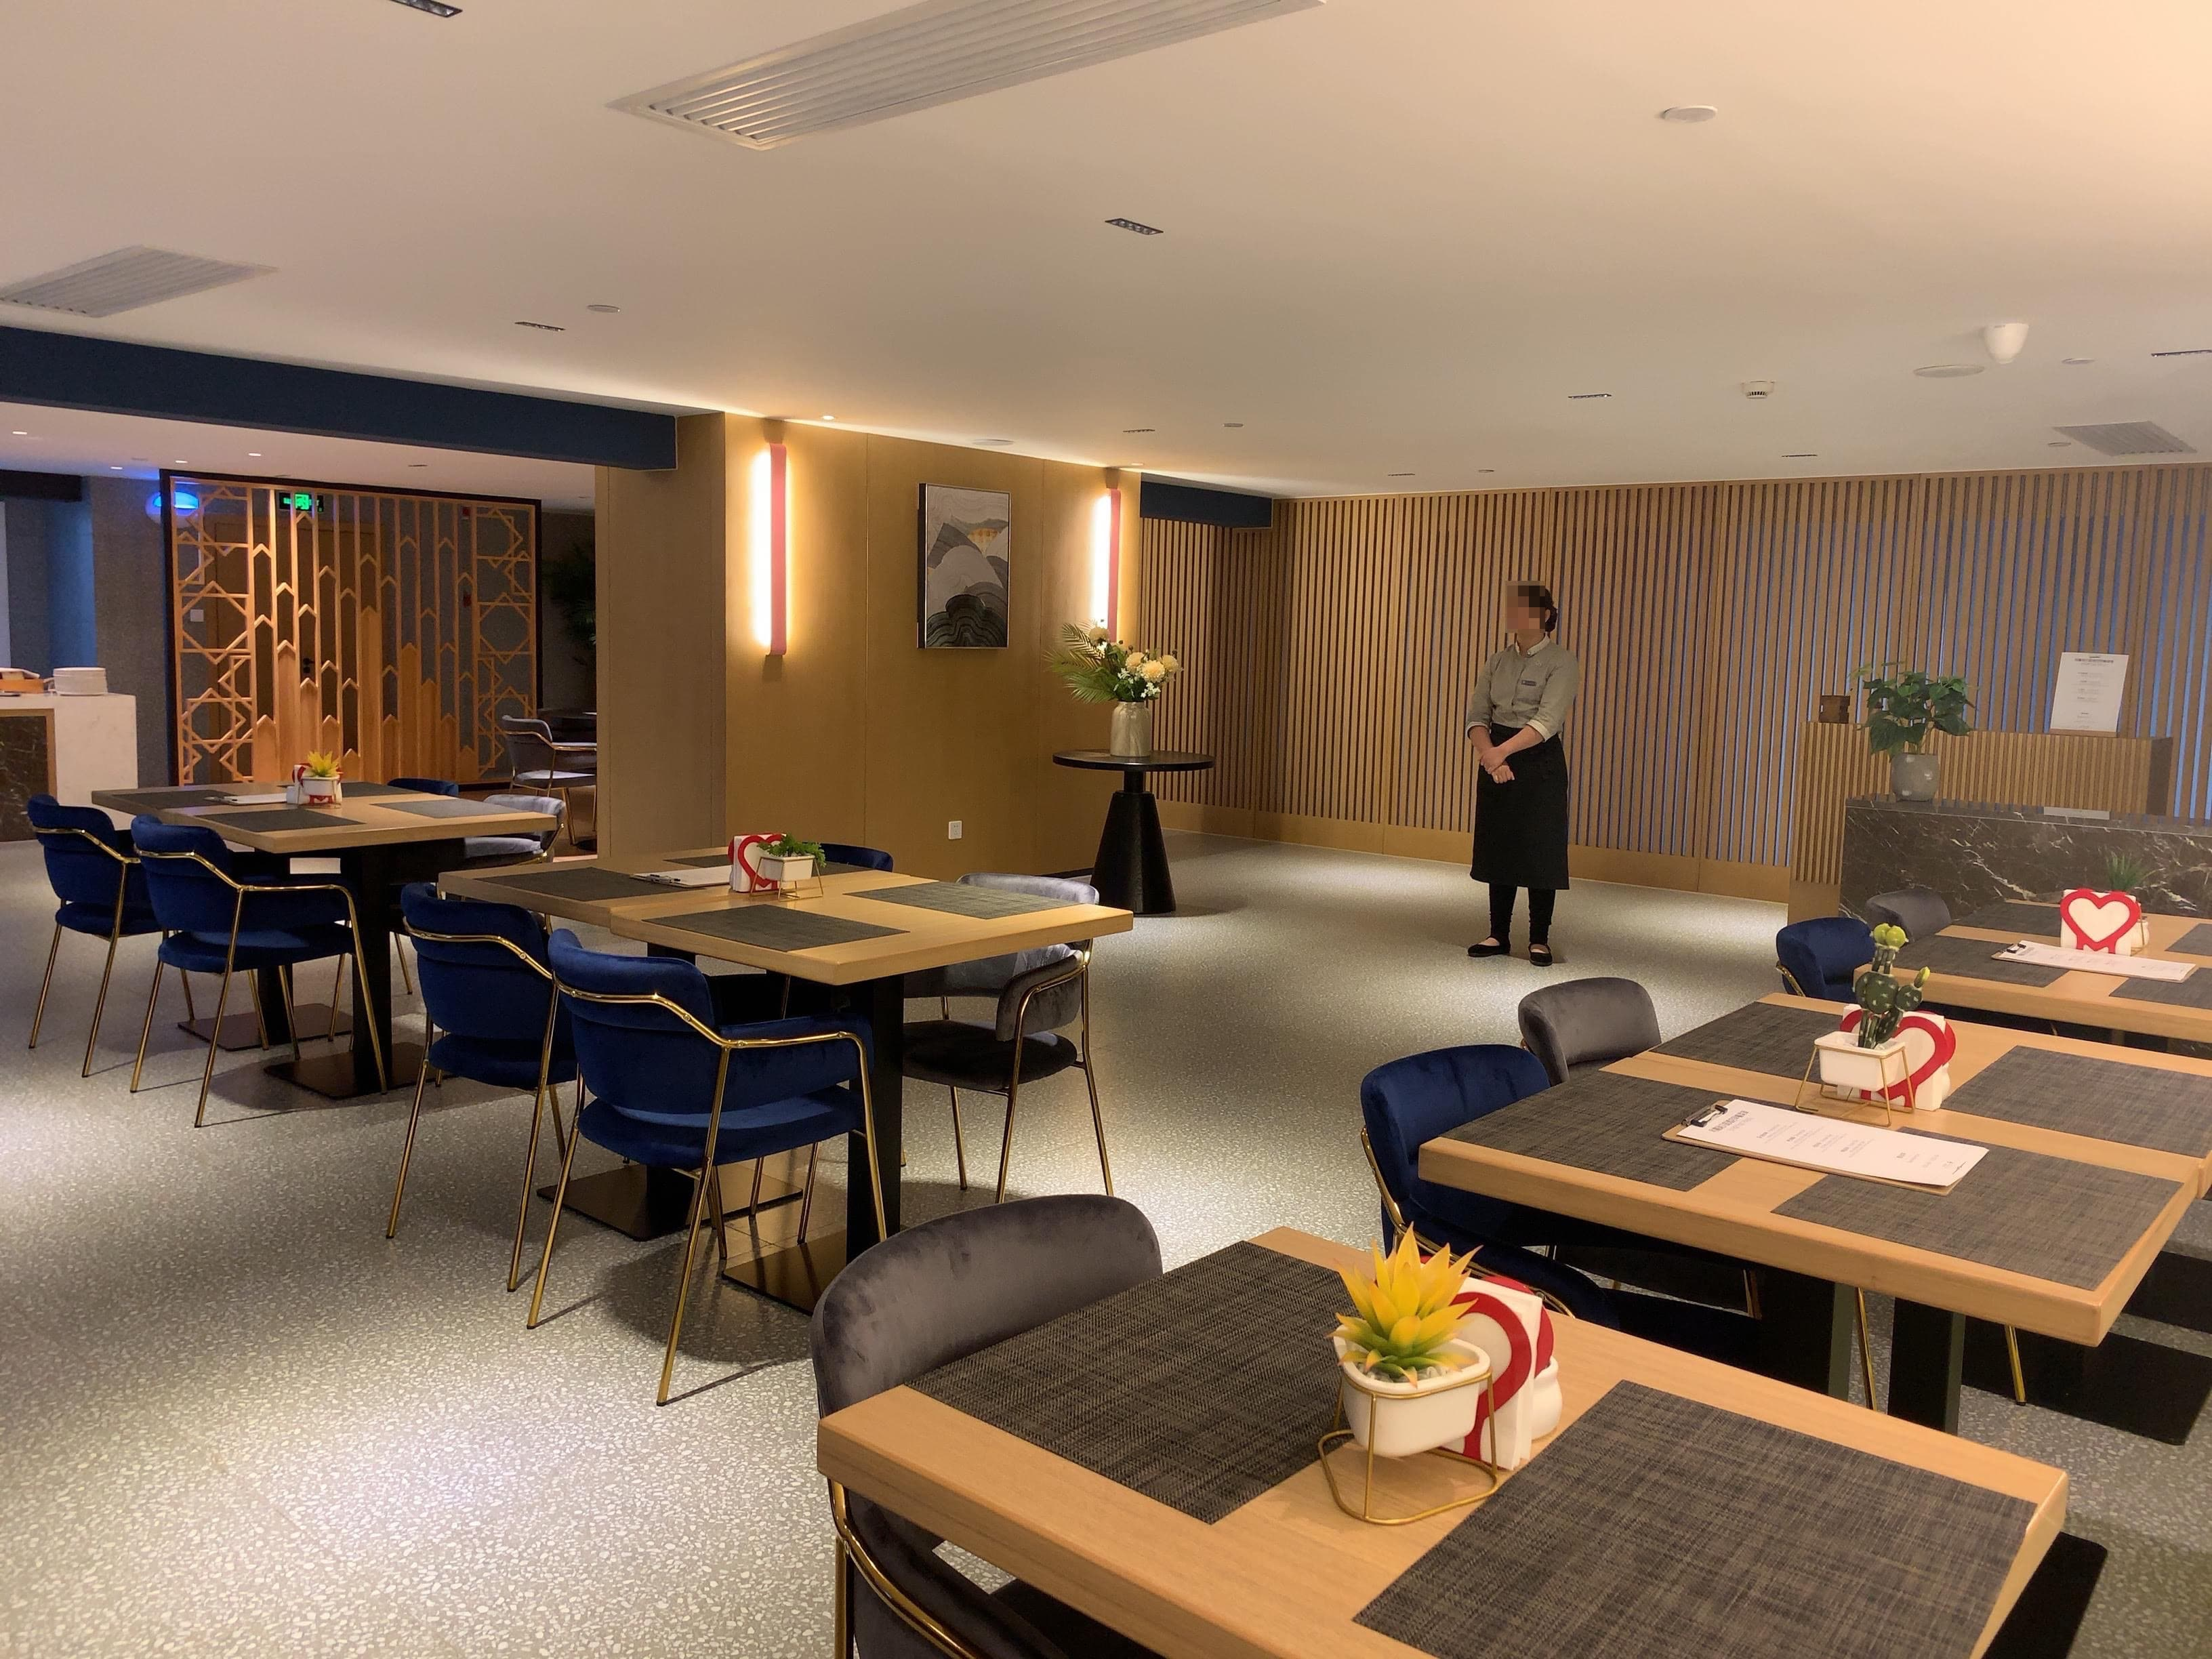 上海虹橋利嘉瑞貝庭公寓酒店(Lijia Suisseplace Apart's Hotel, Hongqiao, Shanghai)